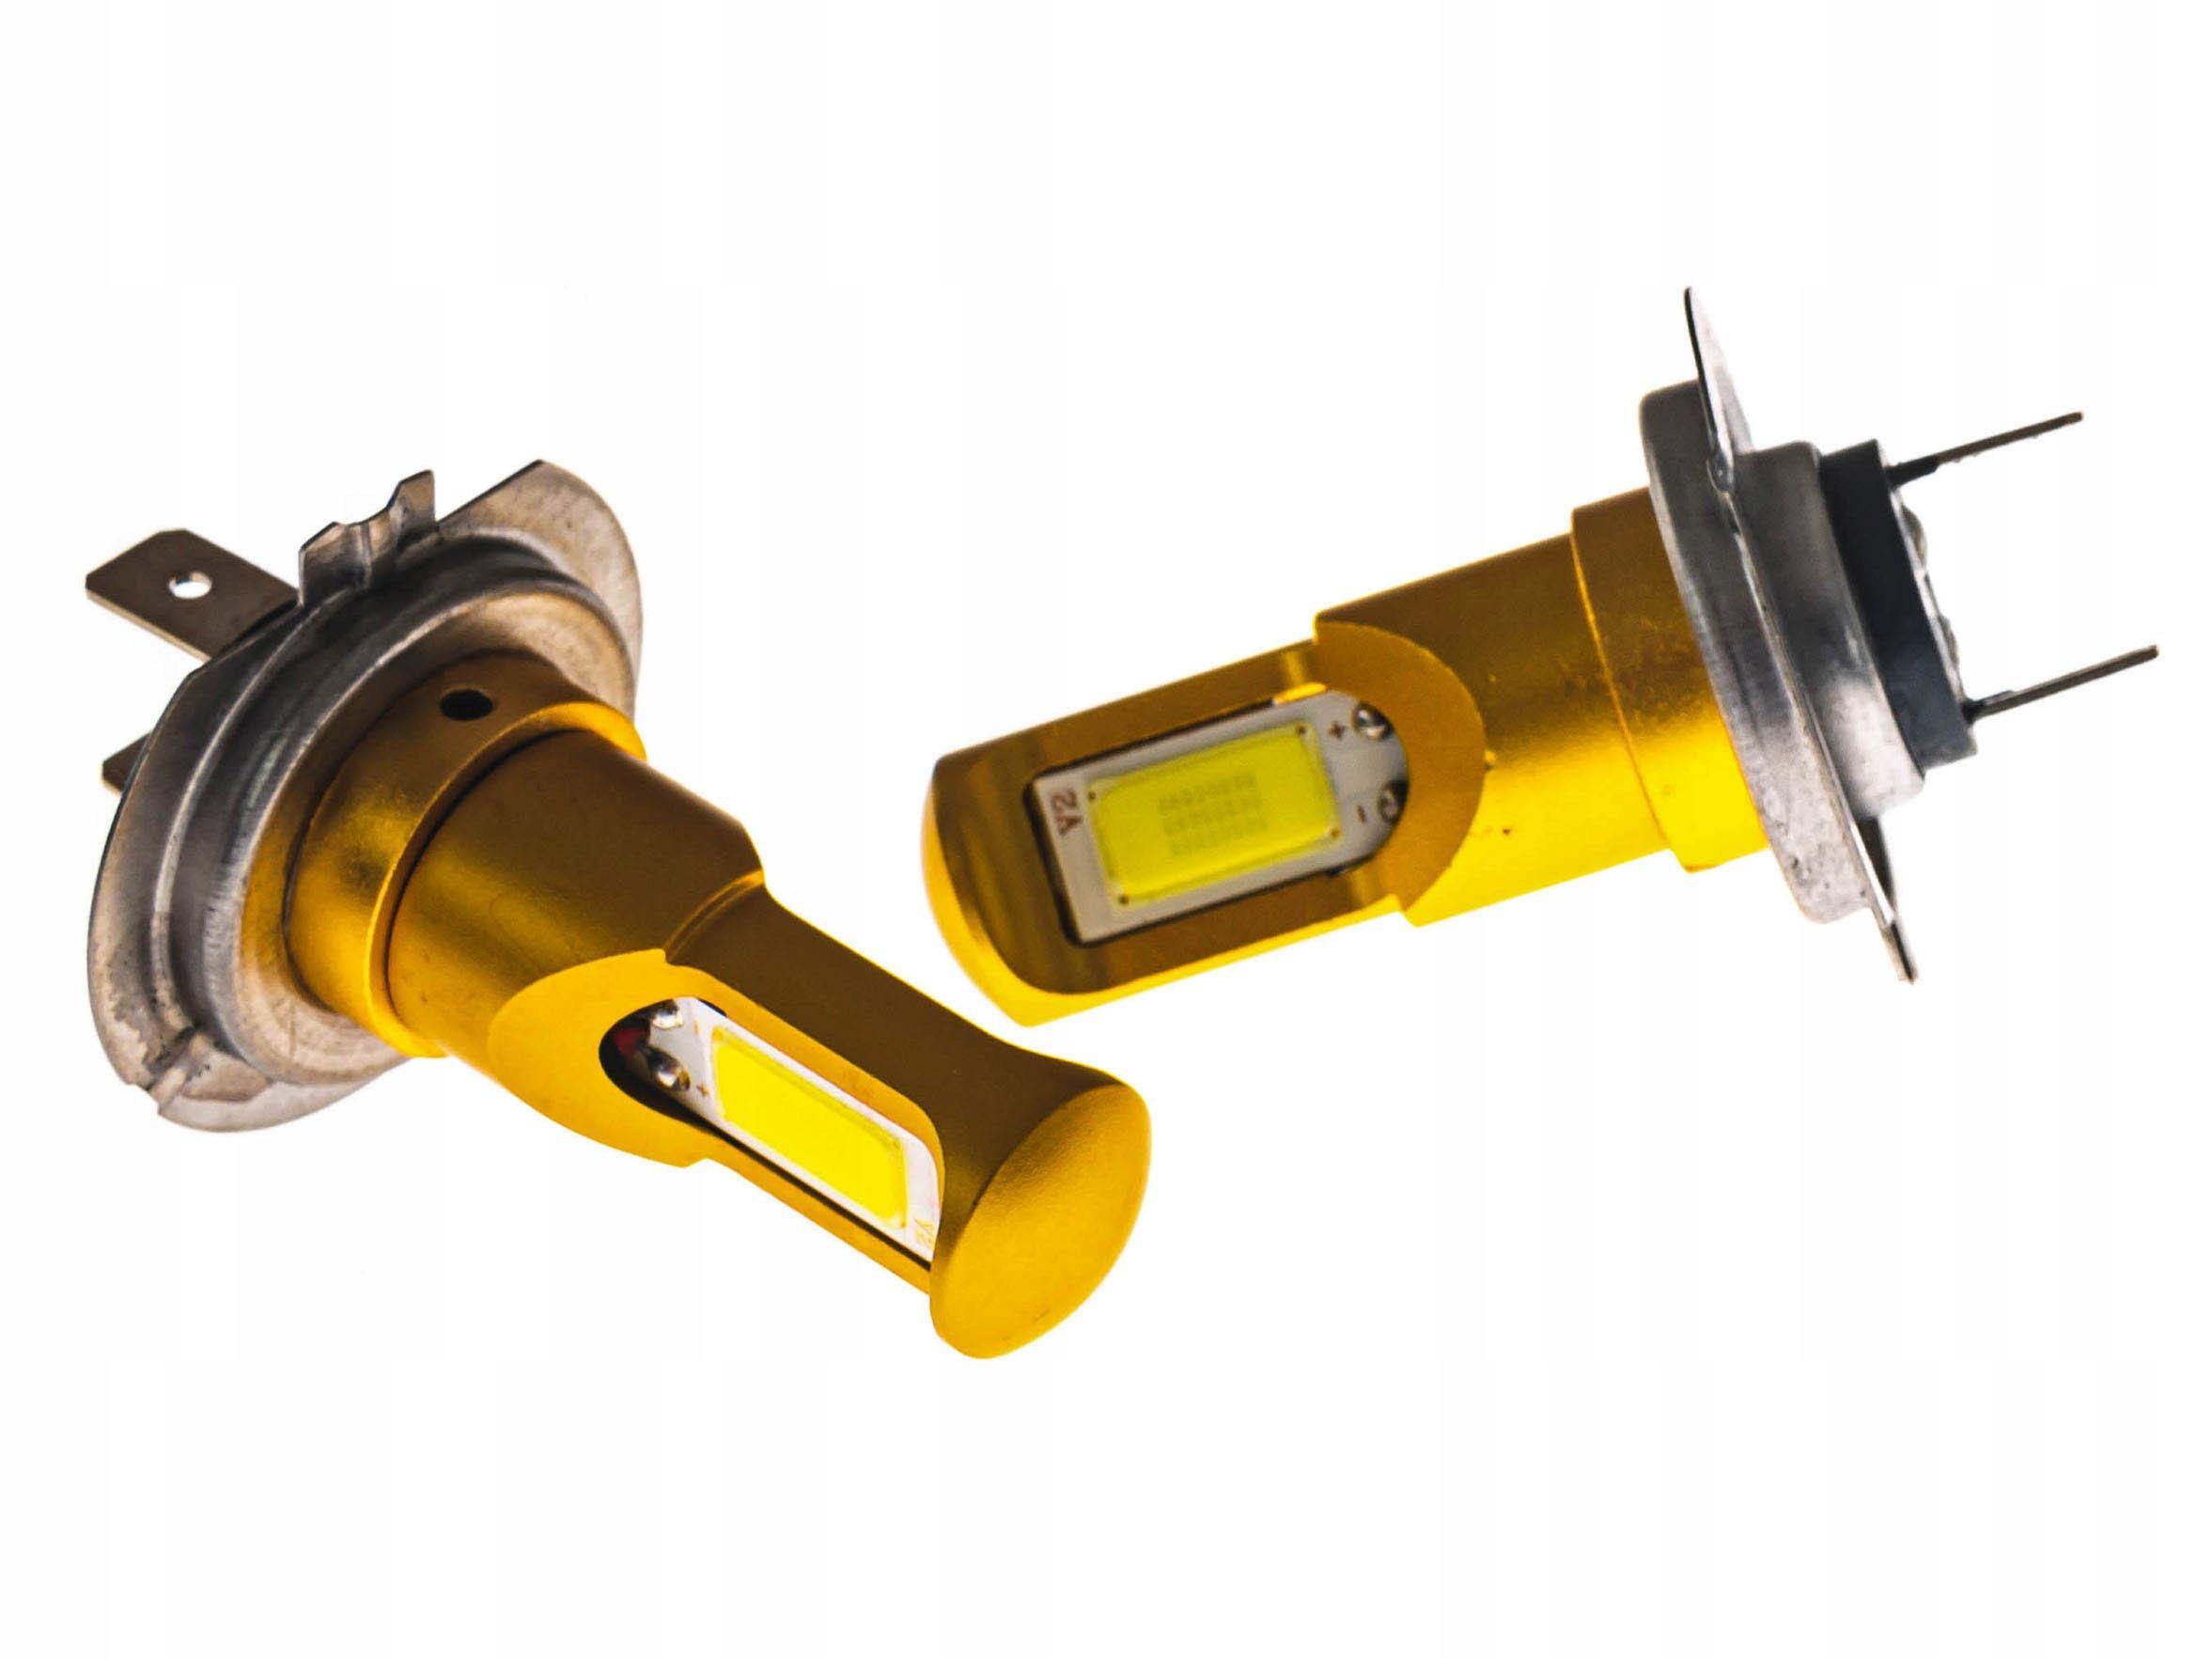 H7 - Bez ADAPTERÓW LED - Zamiennik Żarówki H7 EAN 123456789012